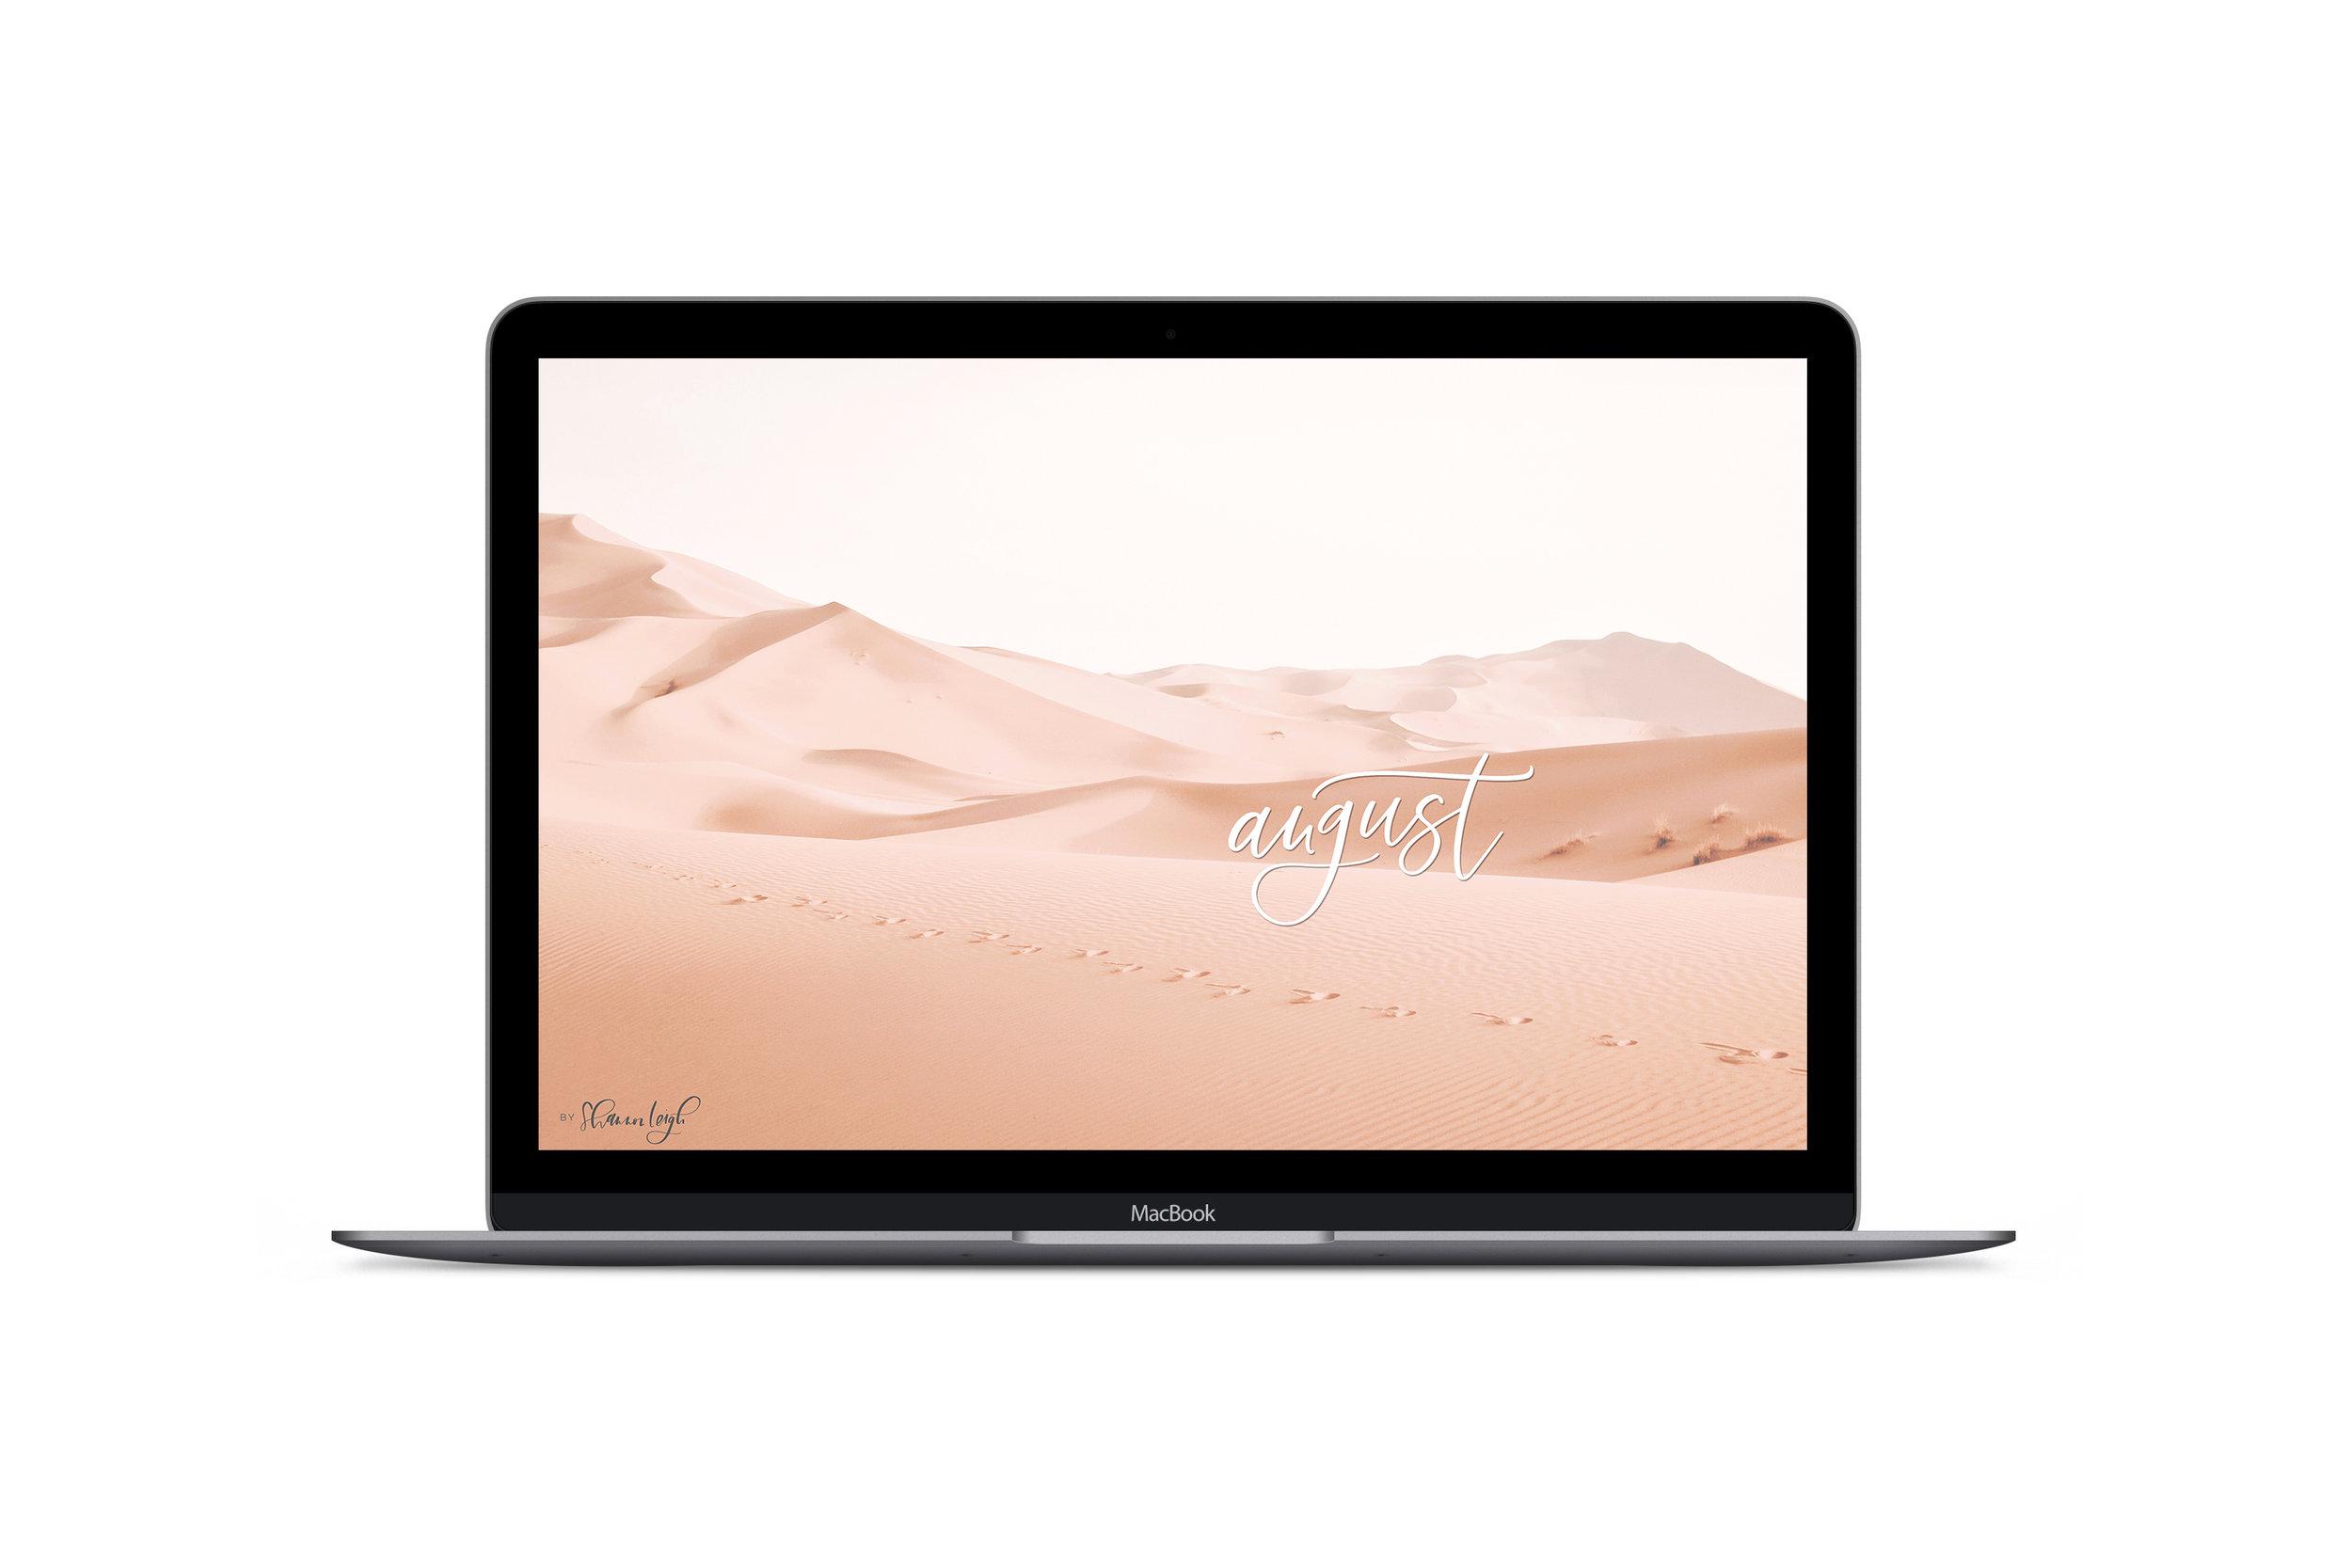 macbook-mock-dribbble.jpg